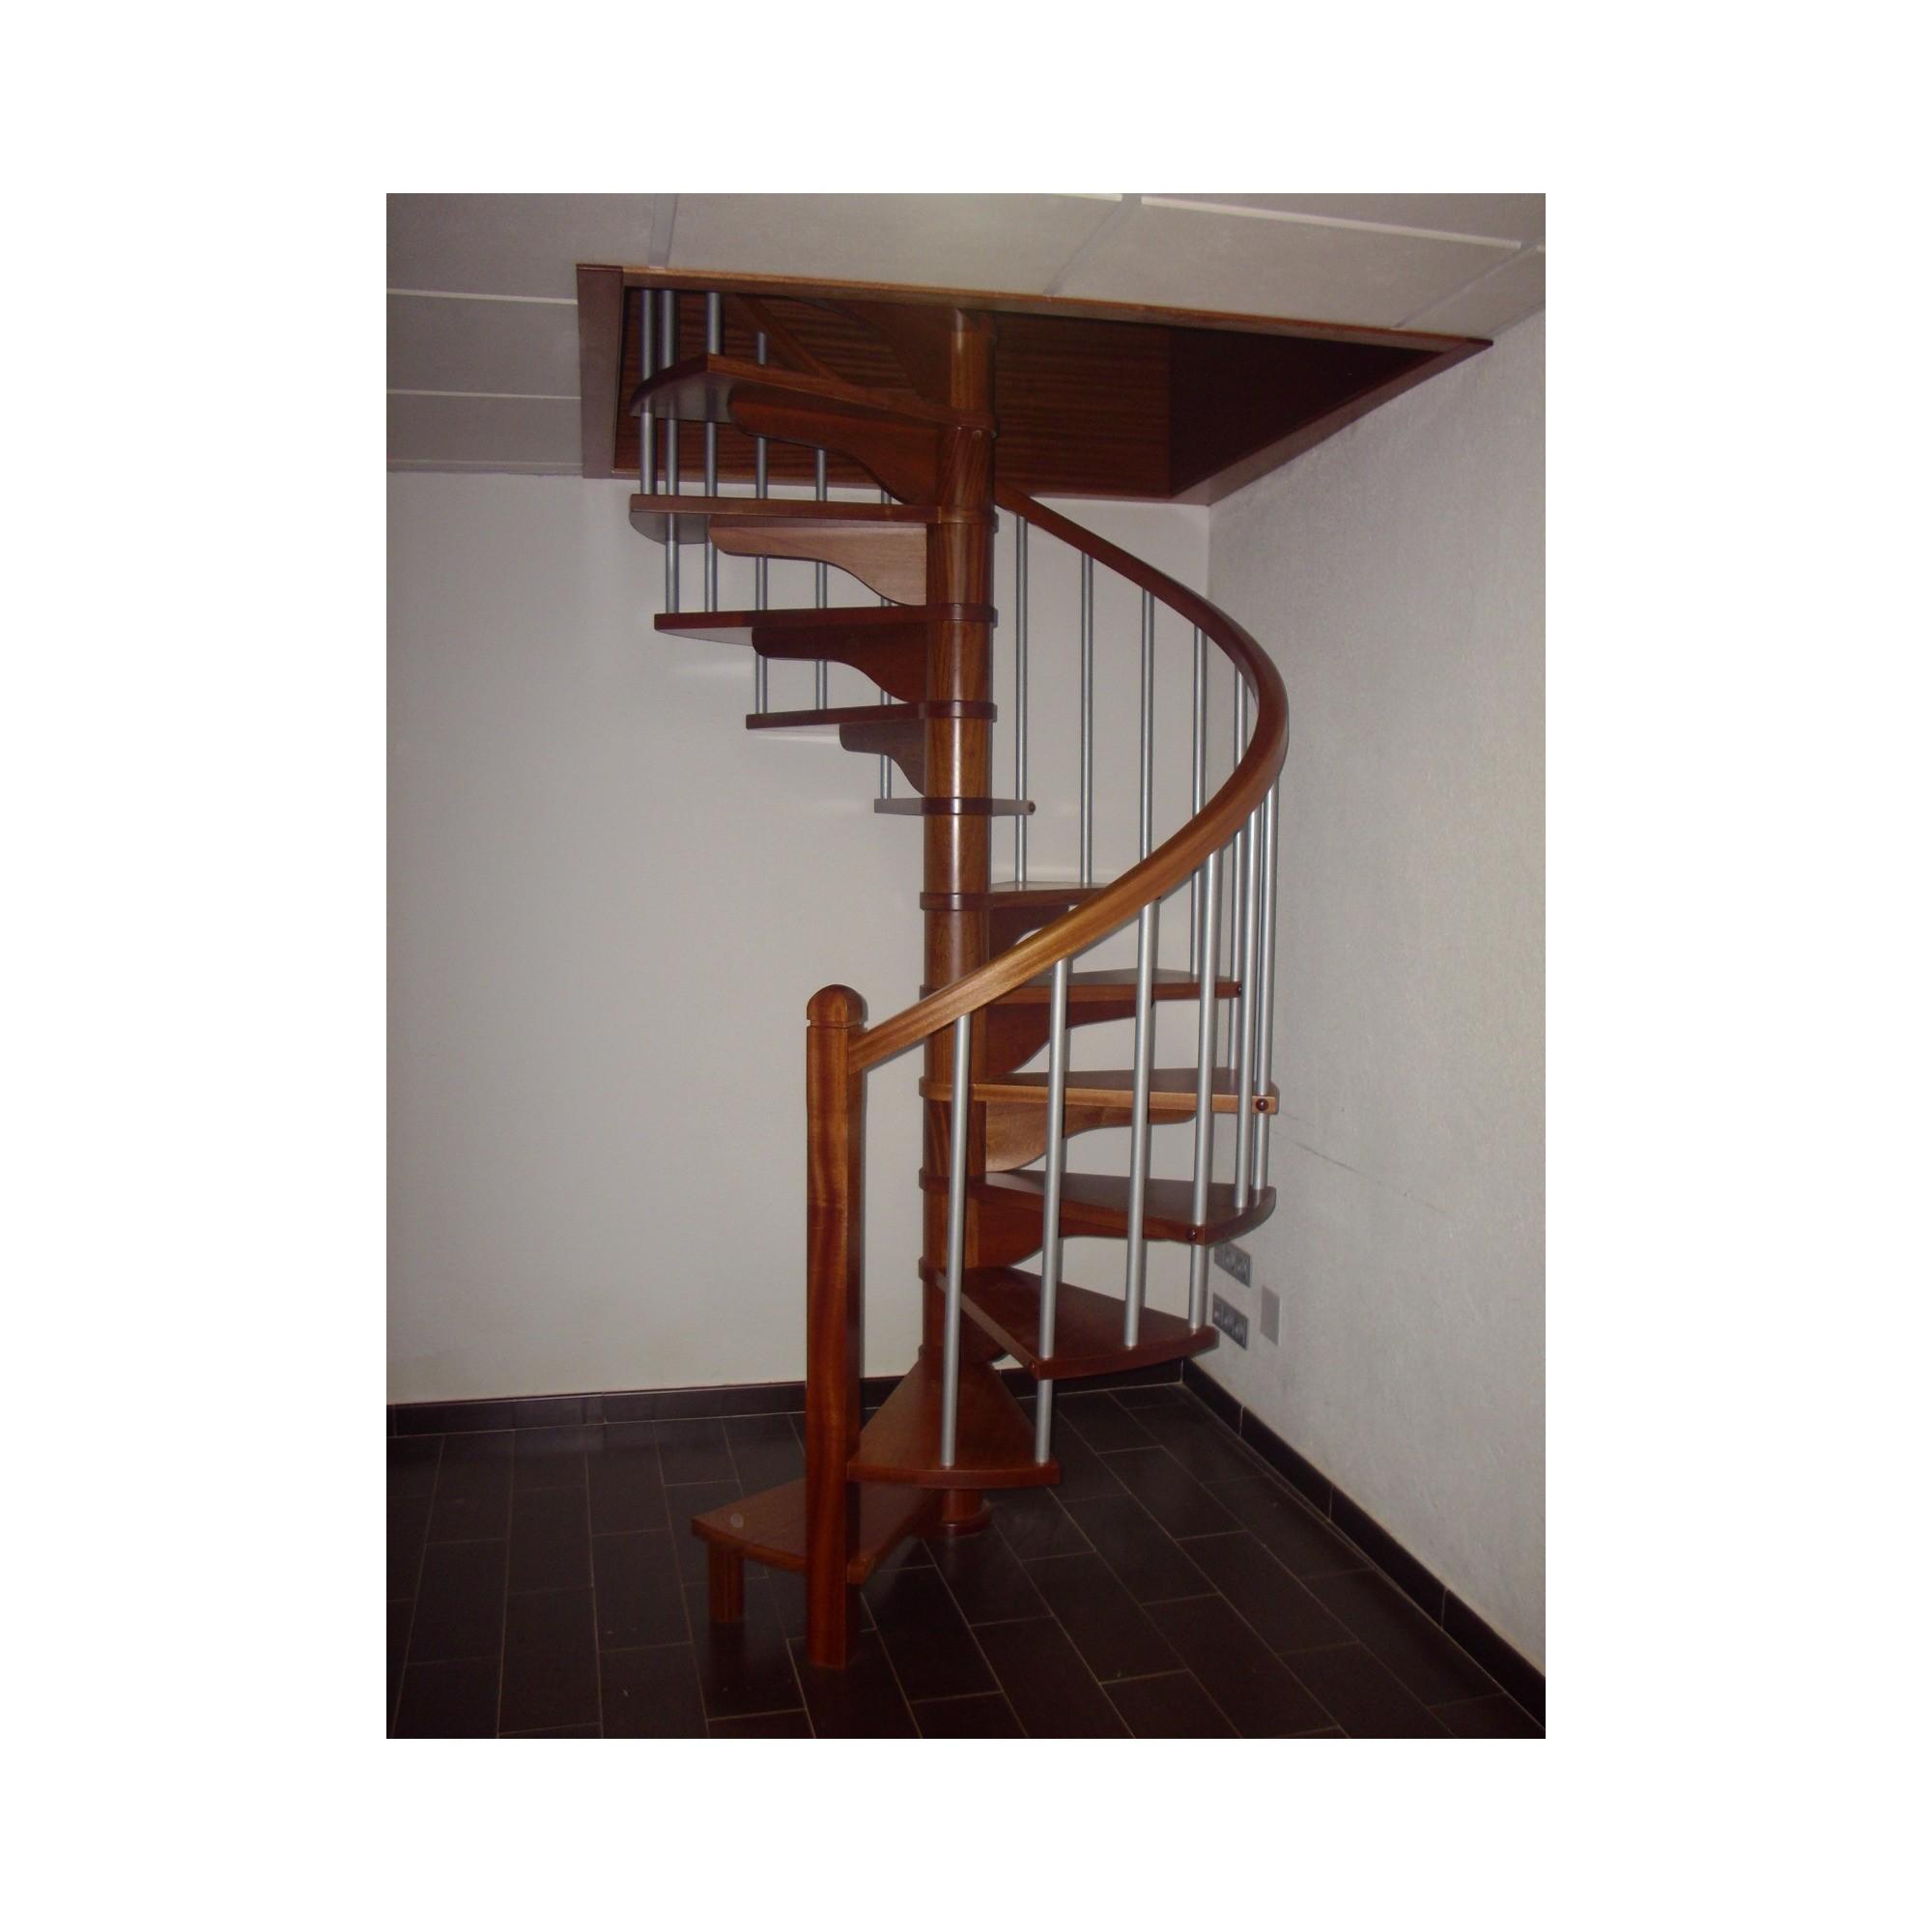 Escalera de caracol de madera amazing escalera caracol - Escaleras de caracol de madera ...